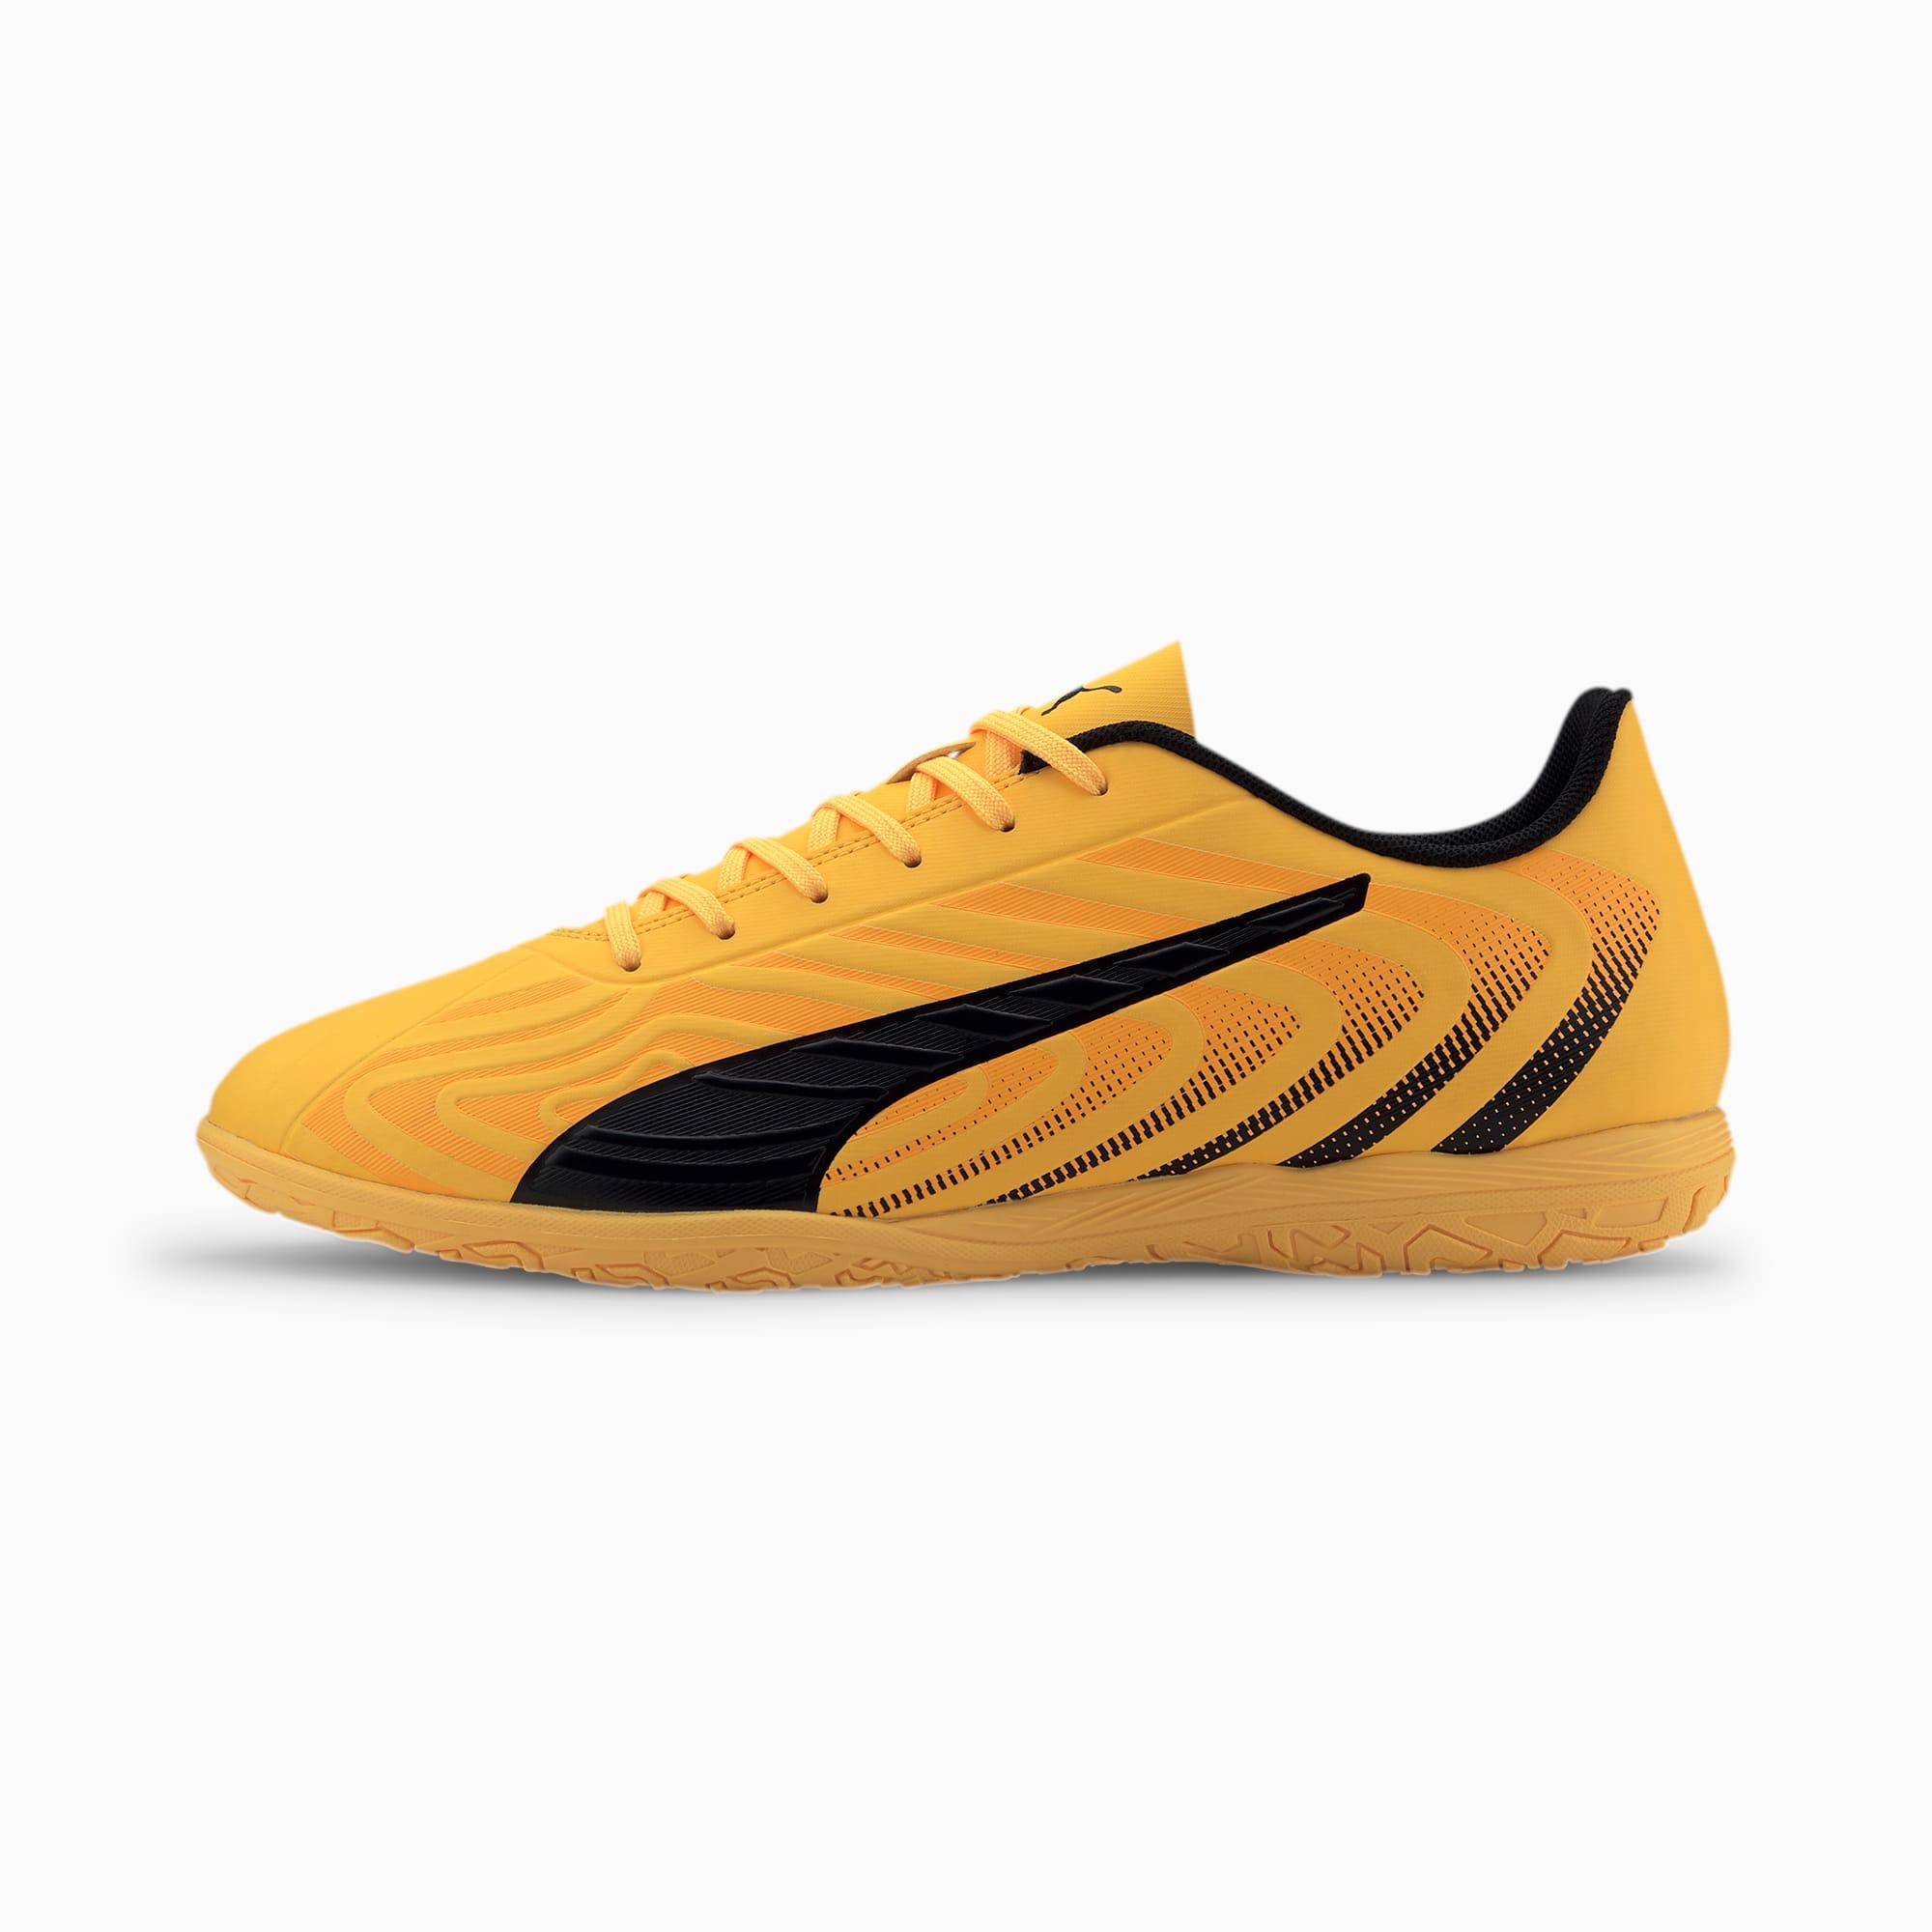 Puma One 20.4 IT Men's Football Boots, Yellow/Black/Orange, size 13, Shoes